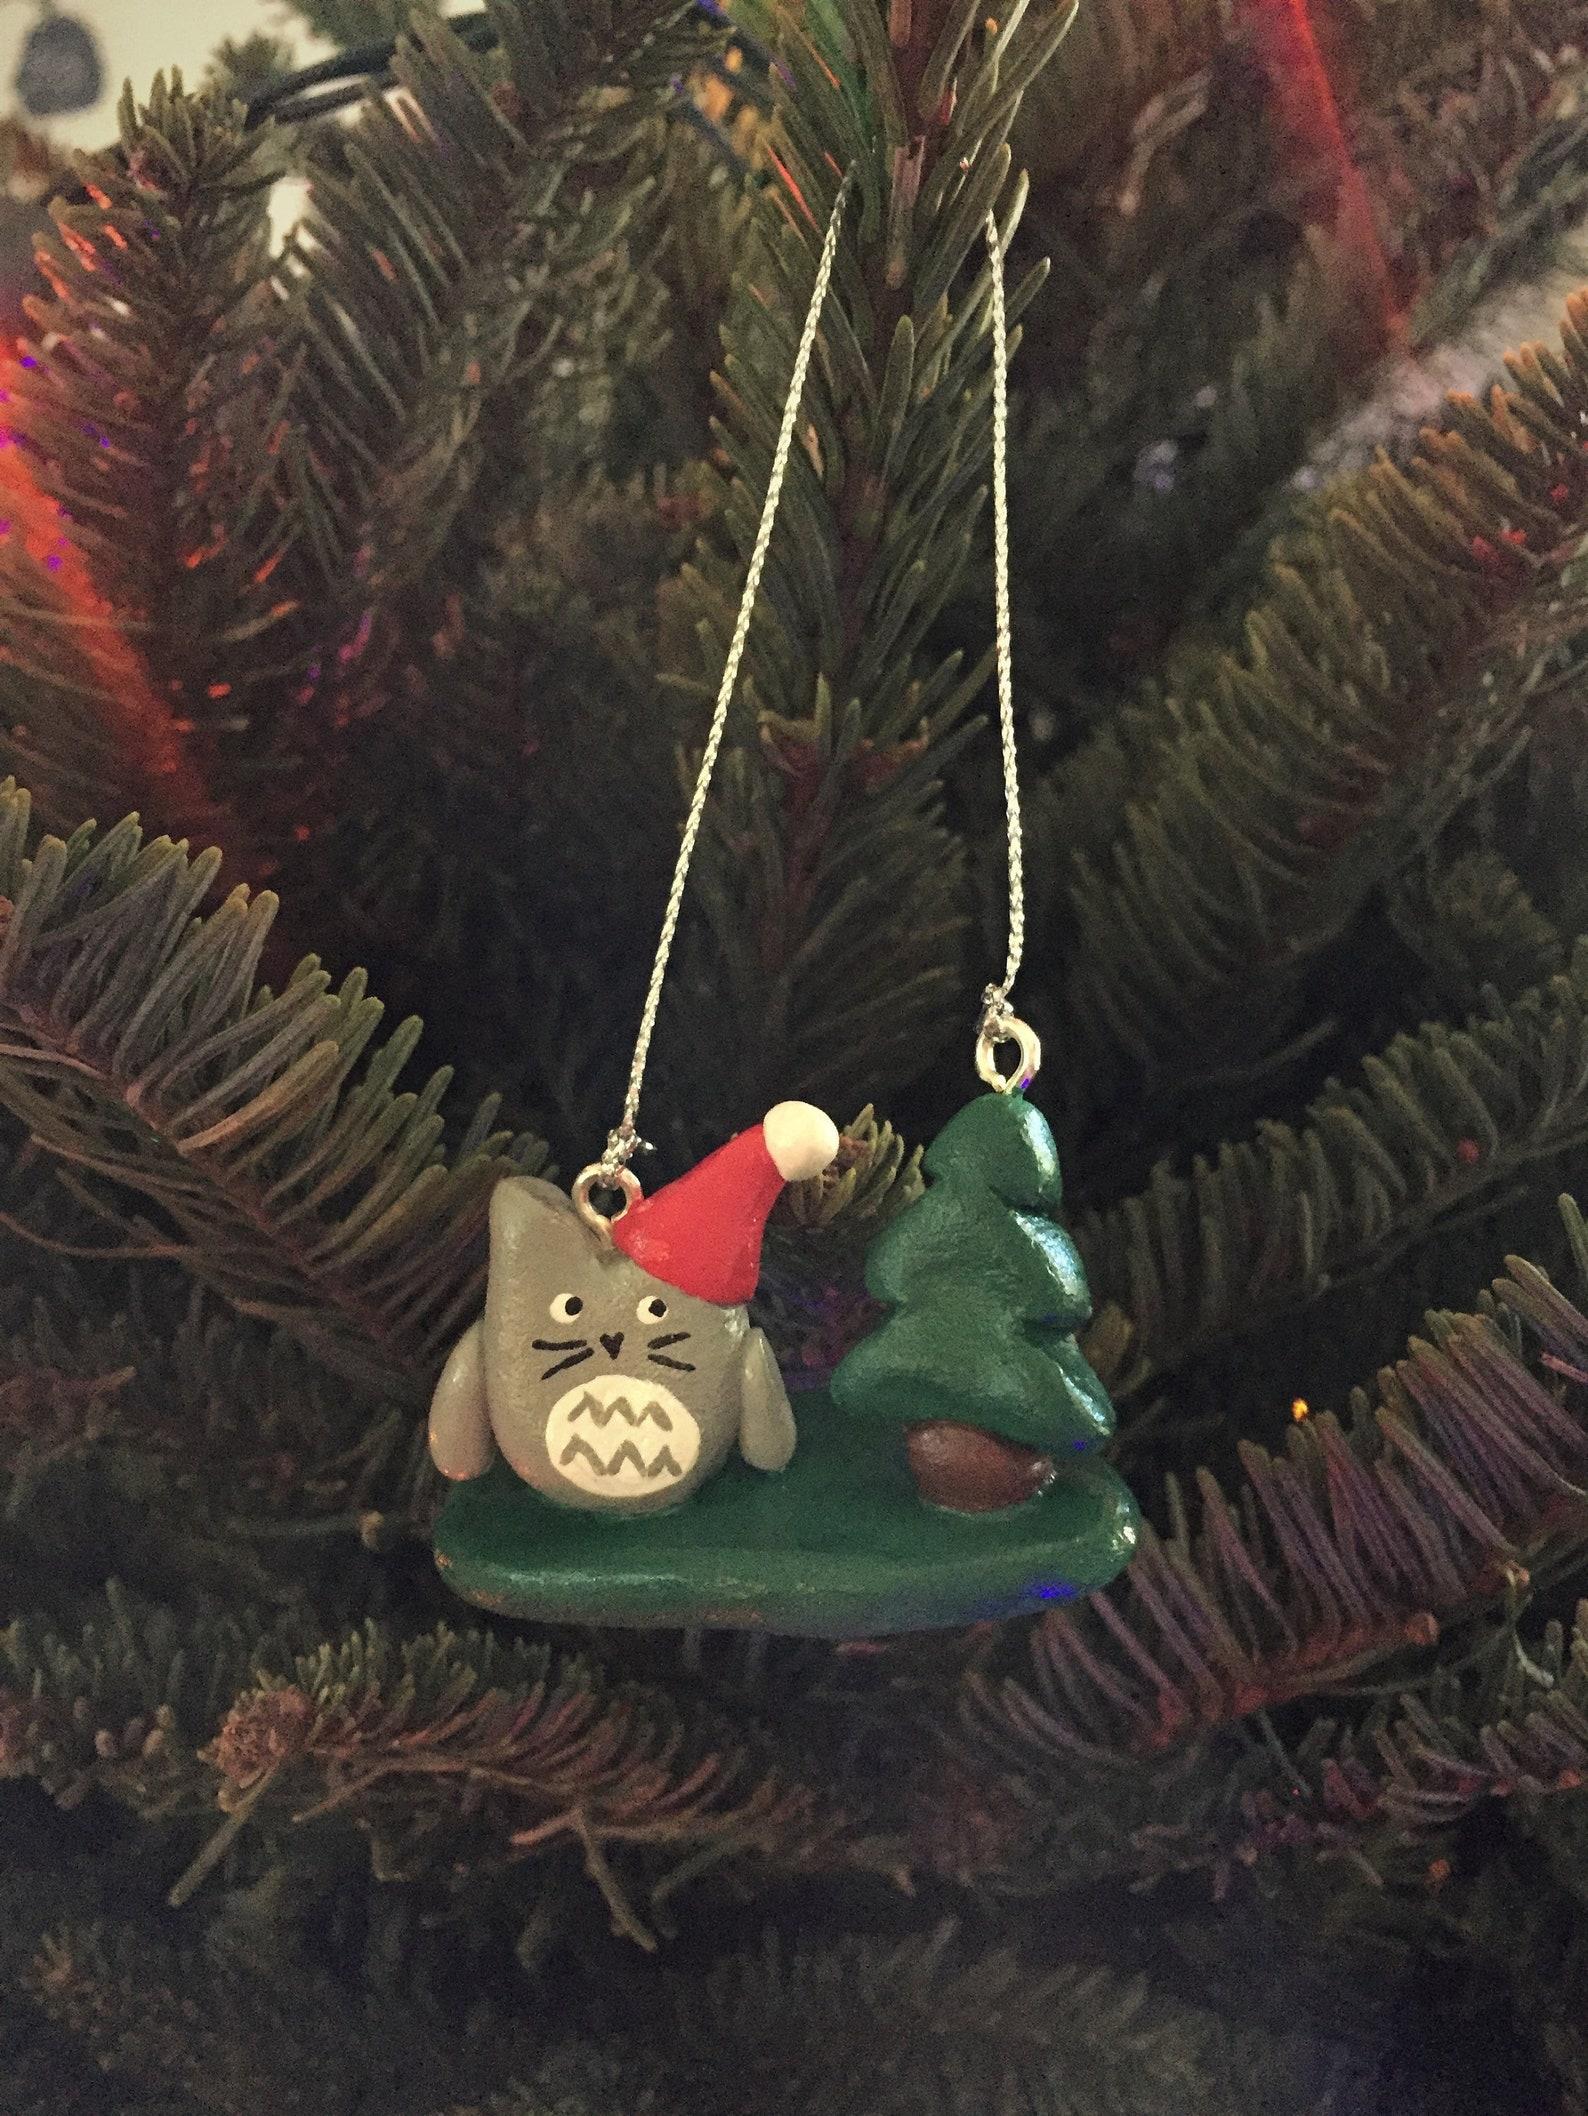 Totoro Christmas Ornament || Miyazaki Fan Art || Studio Ghibli || Handmade